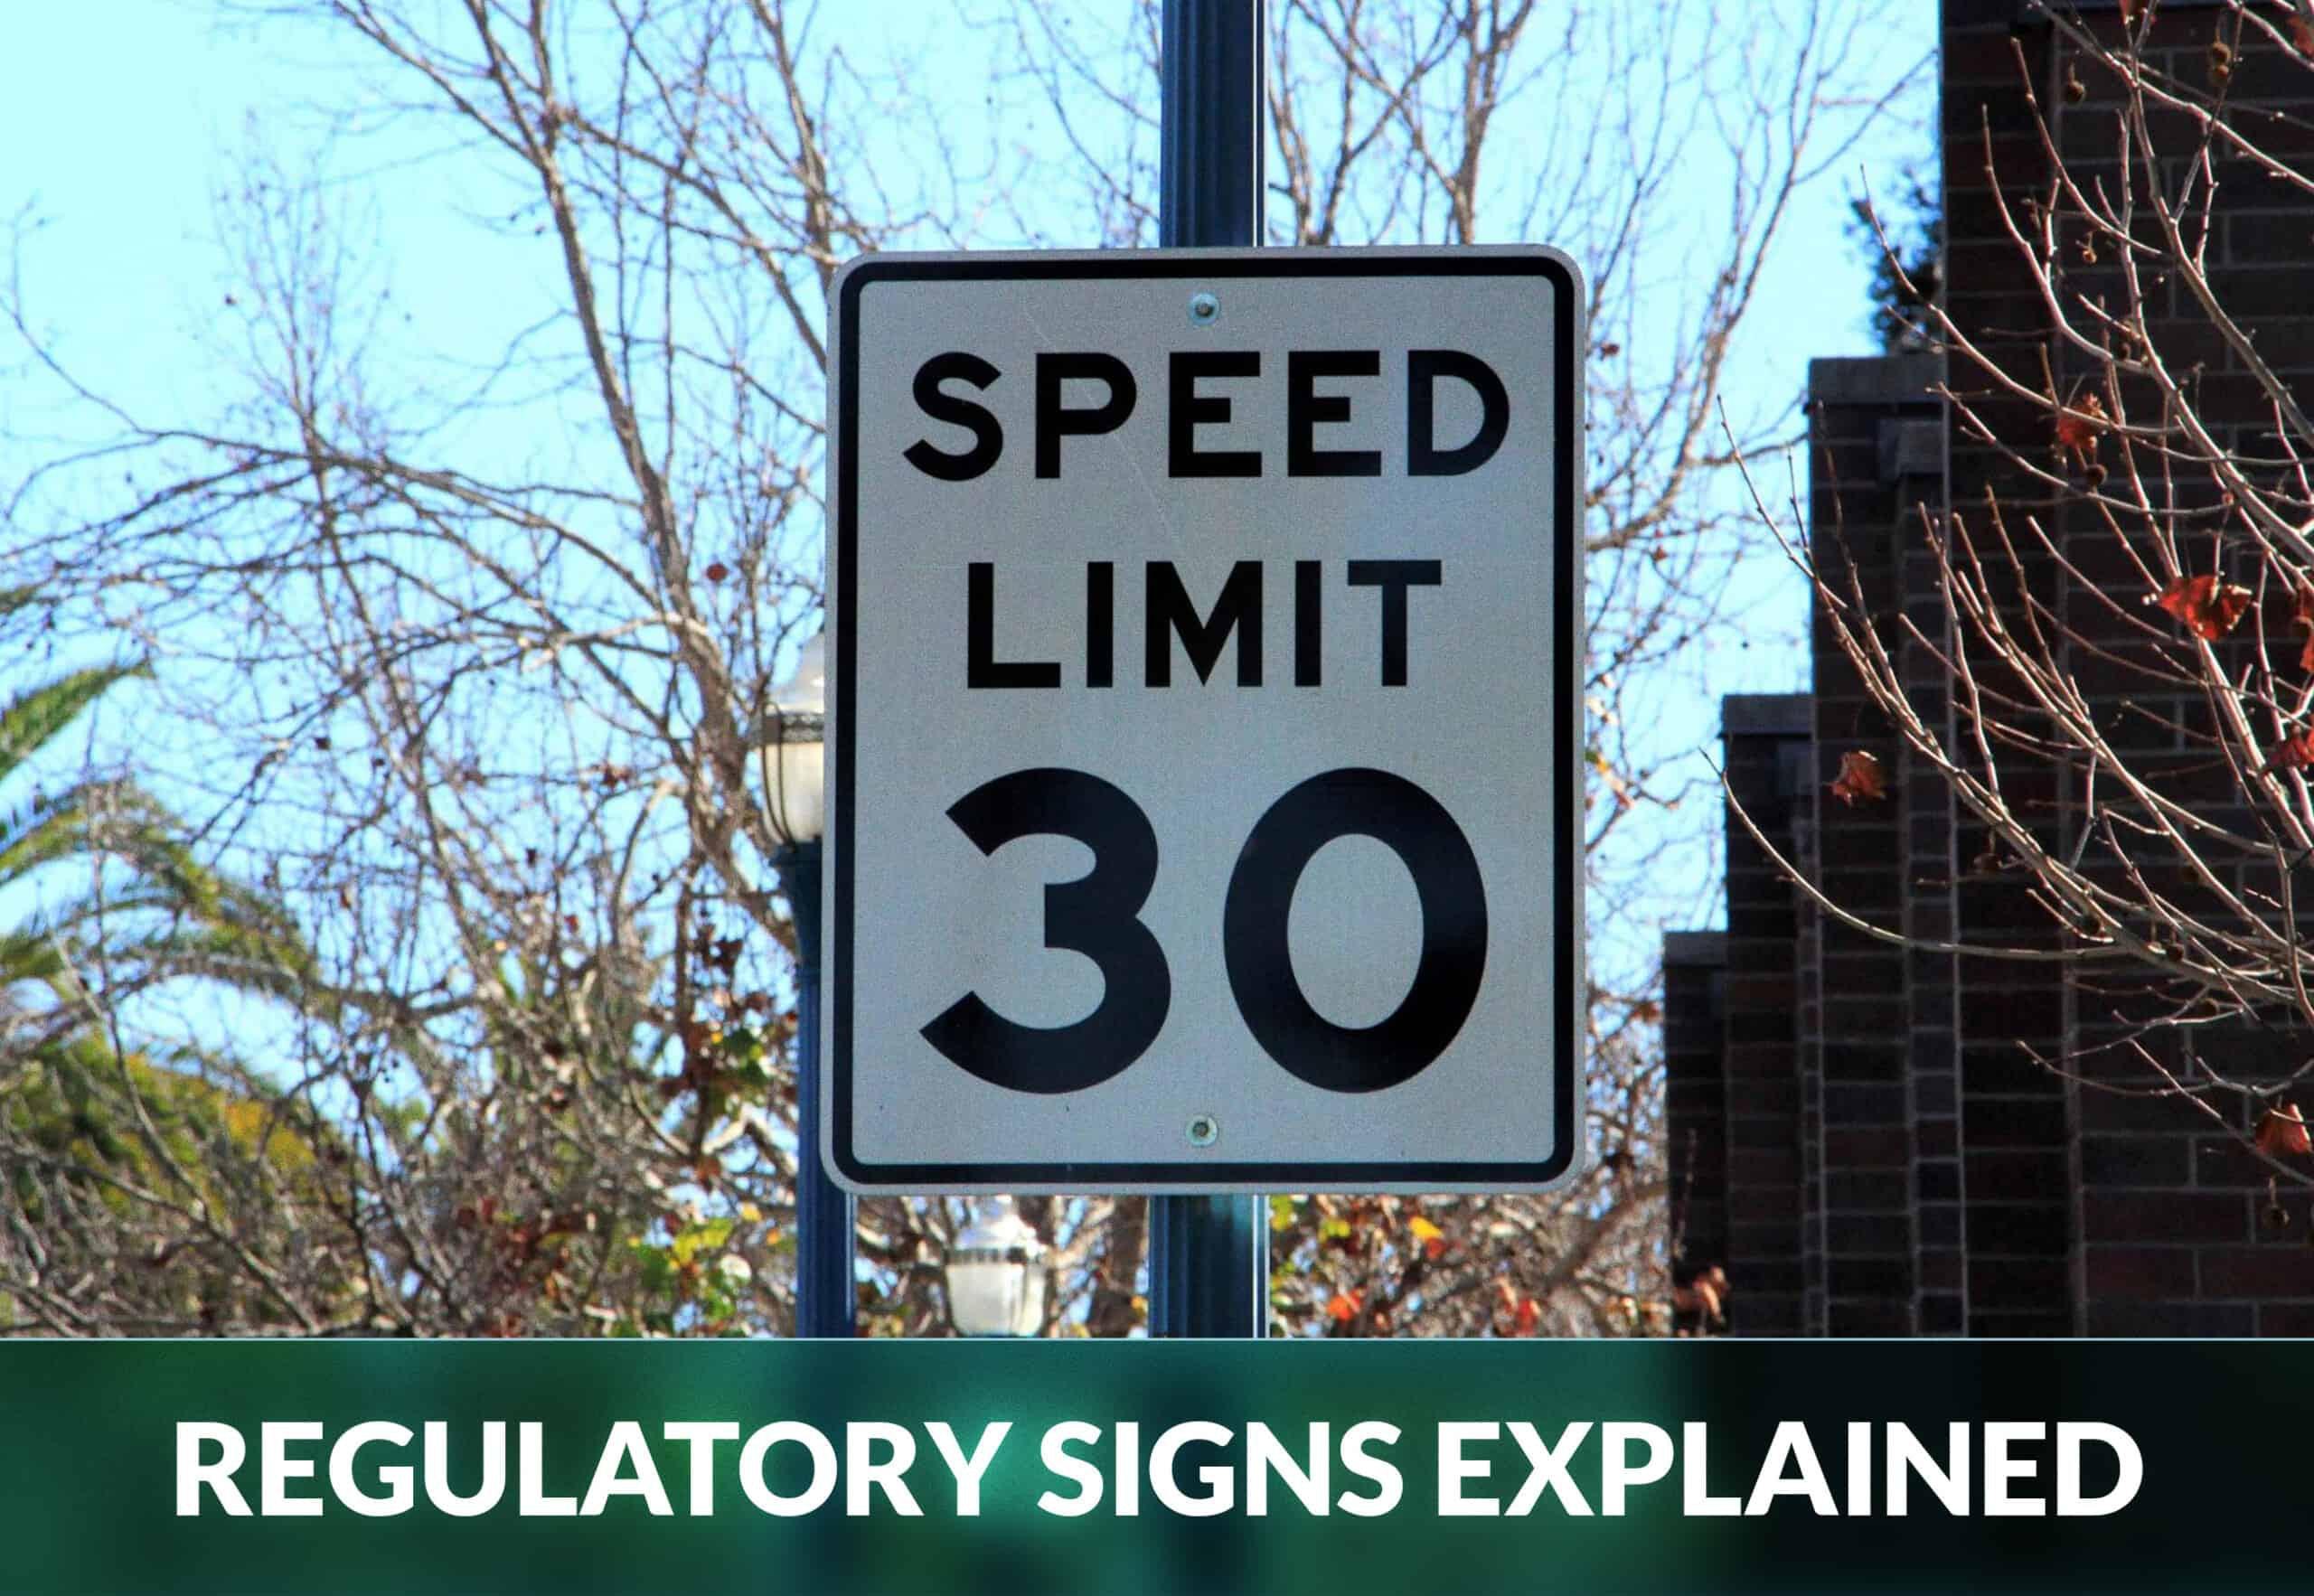 REGULATORY SIGNS EXPLAINED